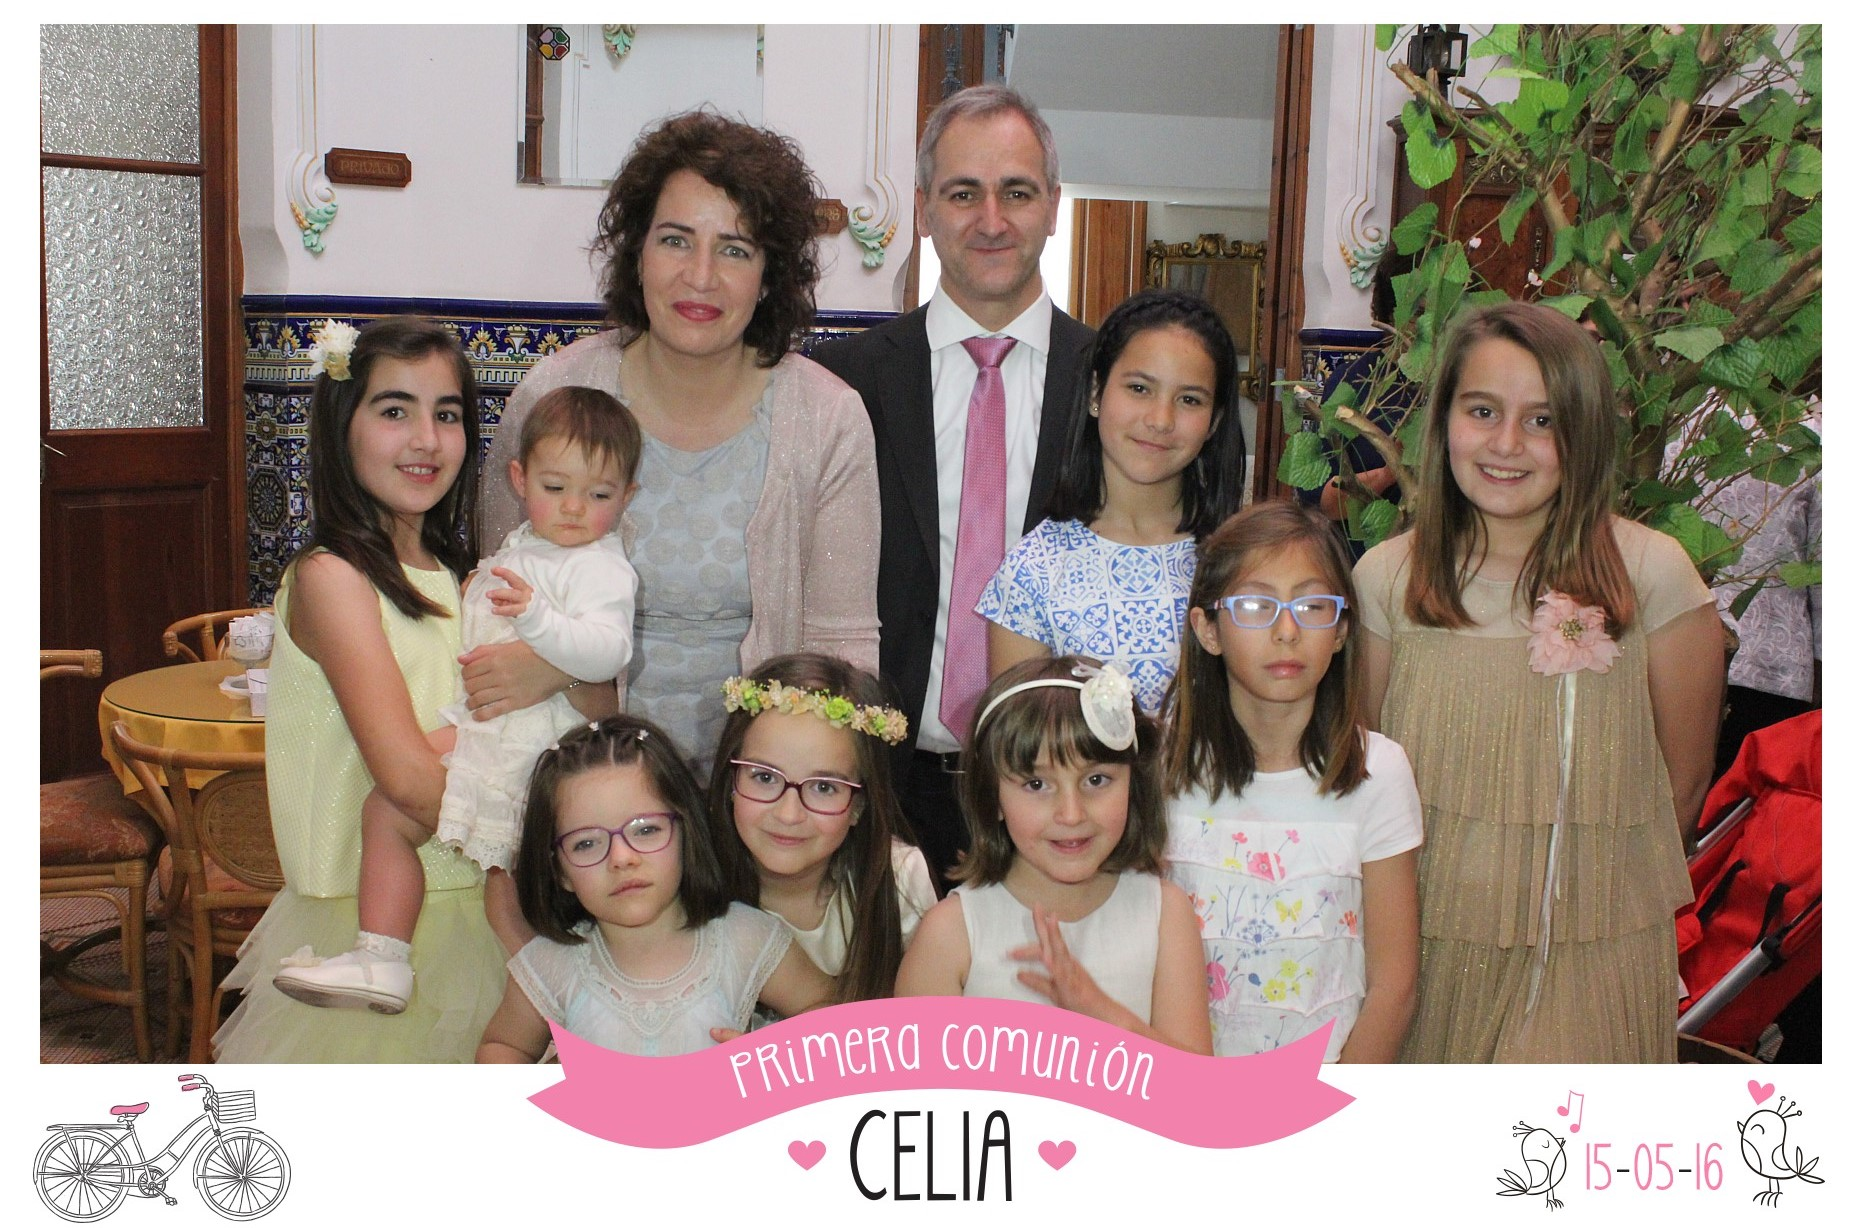 Comunion Celia 15052016 MrFotomaton